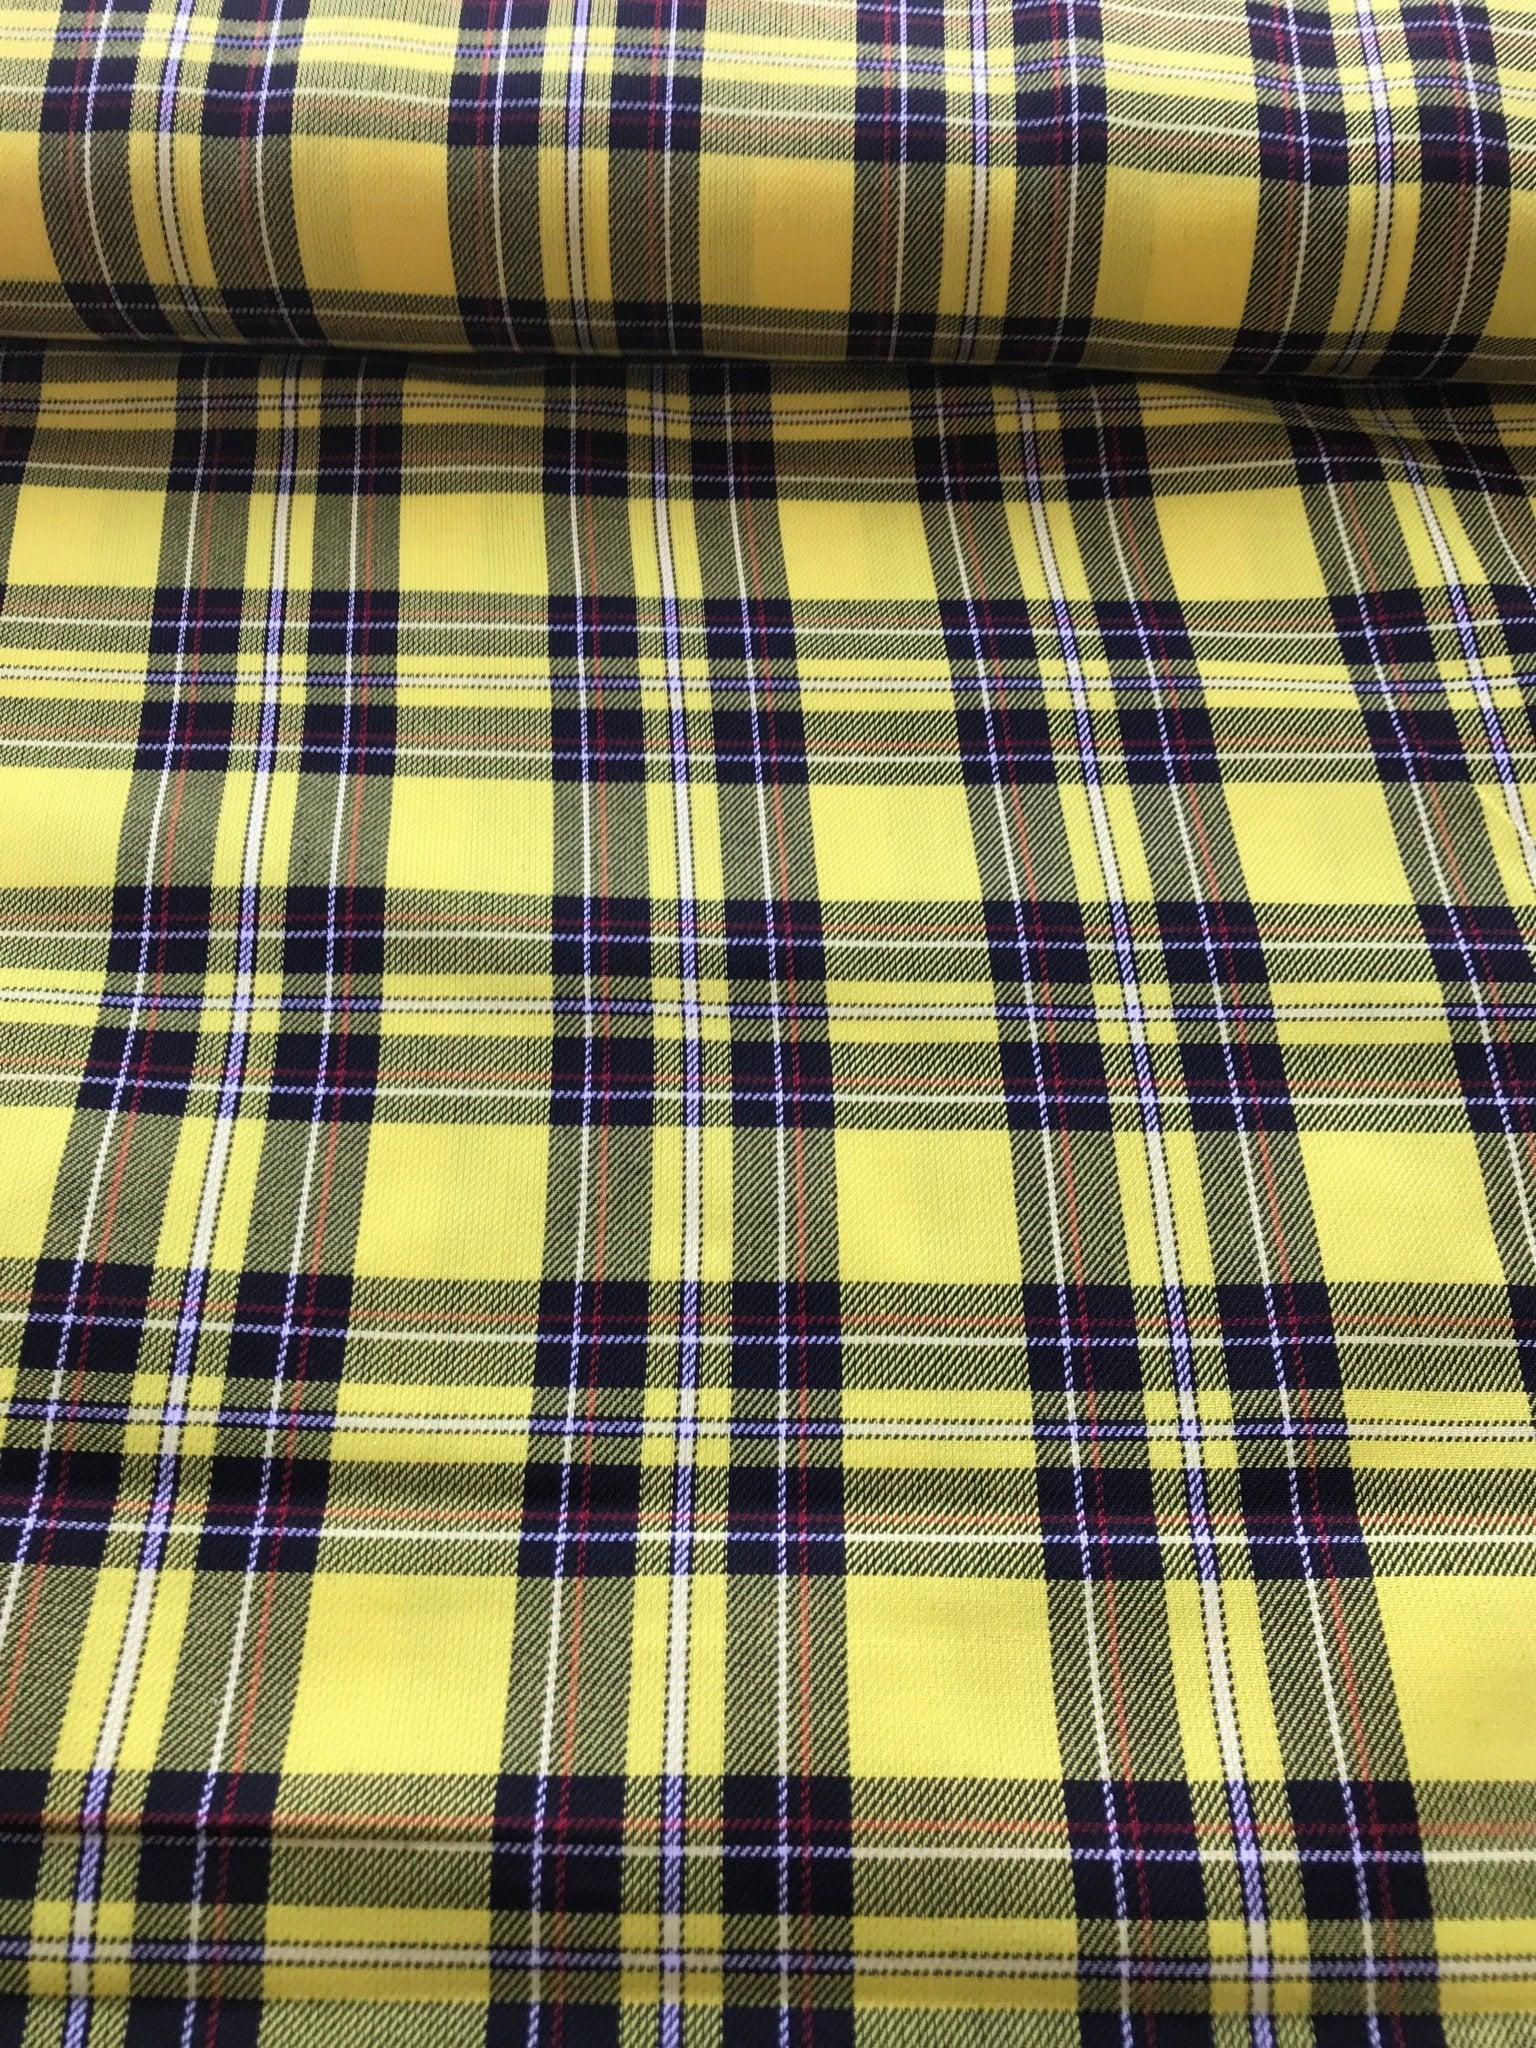 Macleod tartan fabric